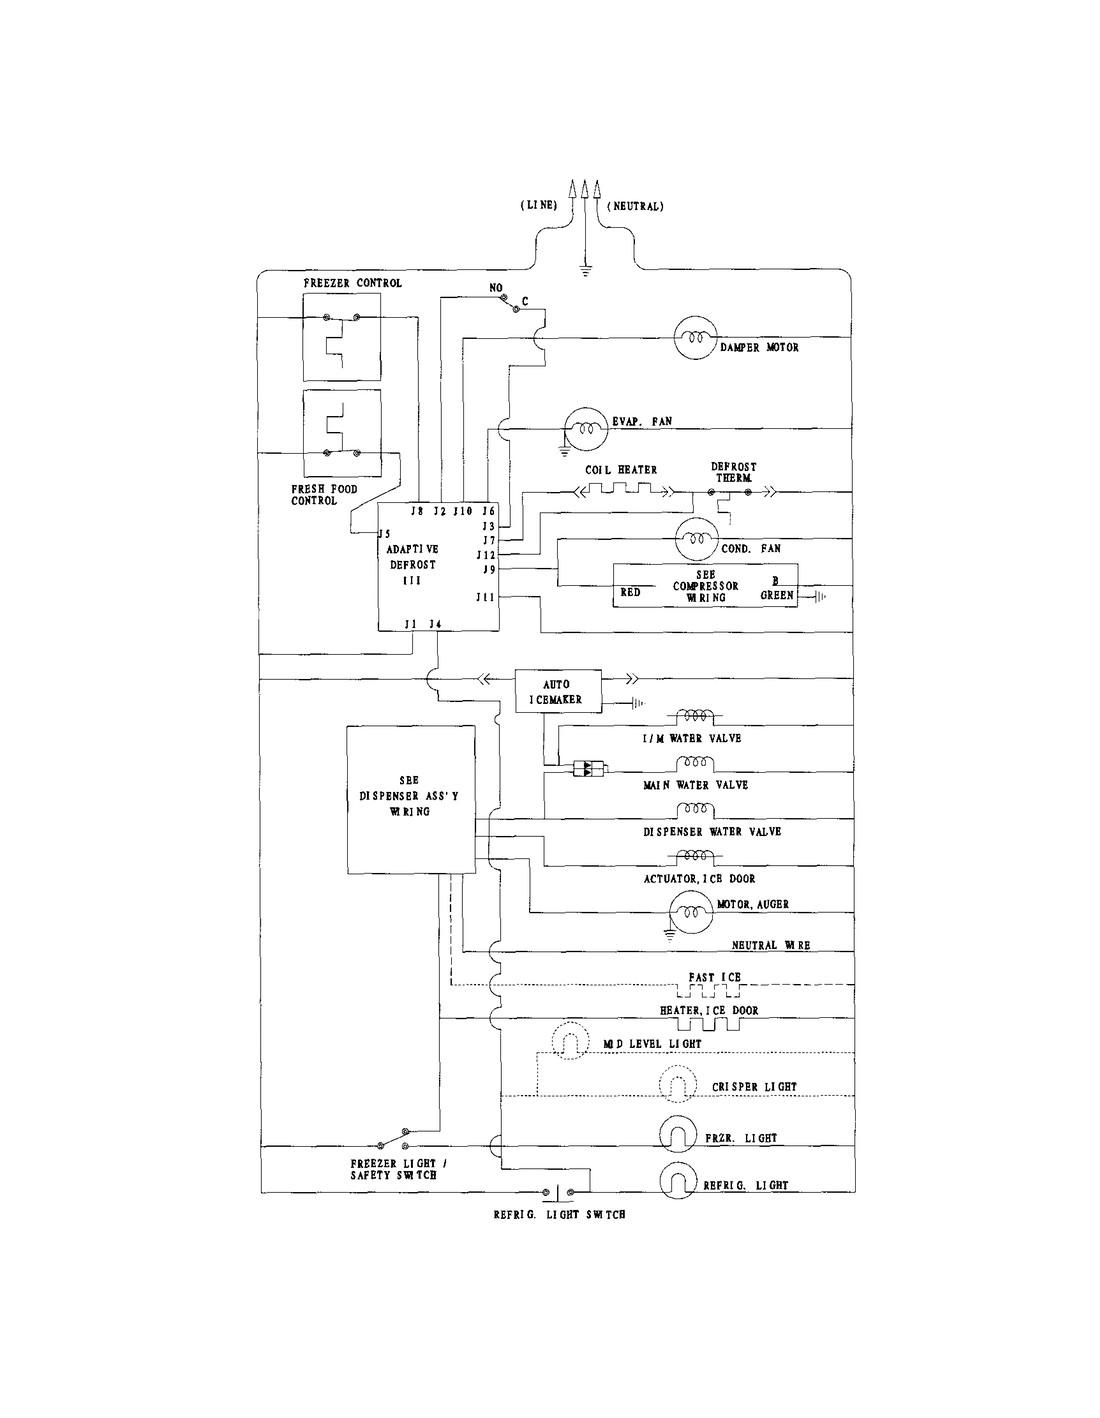 YF_3968] True Refrigerator Gdm 49 Wiring Diagram Download Diagram | True Refrigerator Gdm 49 Wiring Diagram |  | Sputa Synk Opein Mohammedshrine Librar Wiring 101